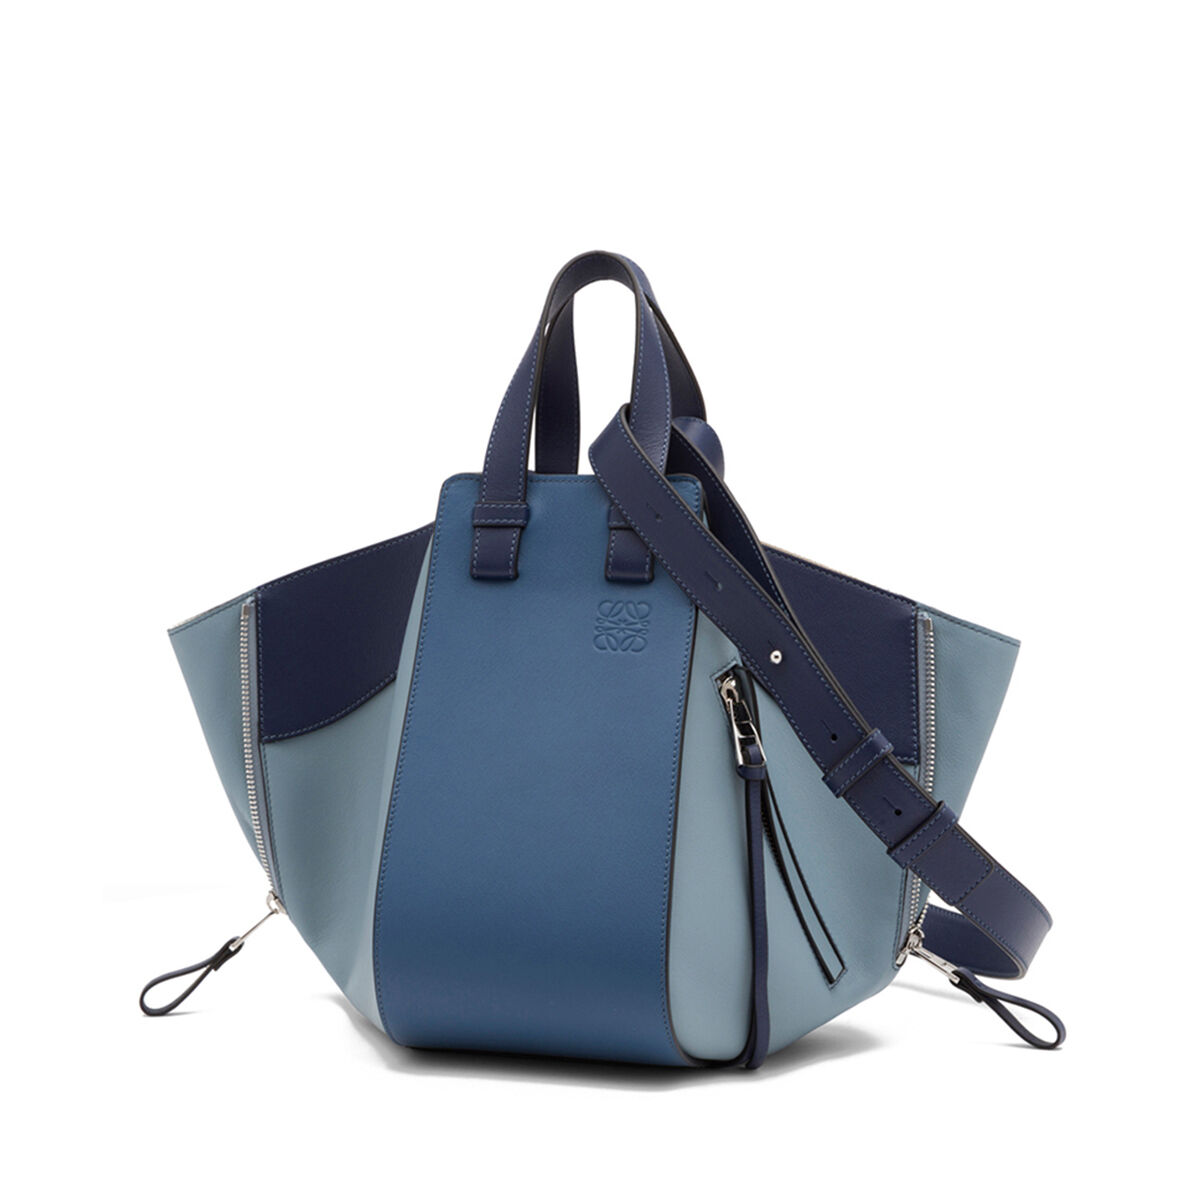 LOEWE Hammock Small Bag Varsity Blue Multitone all